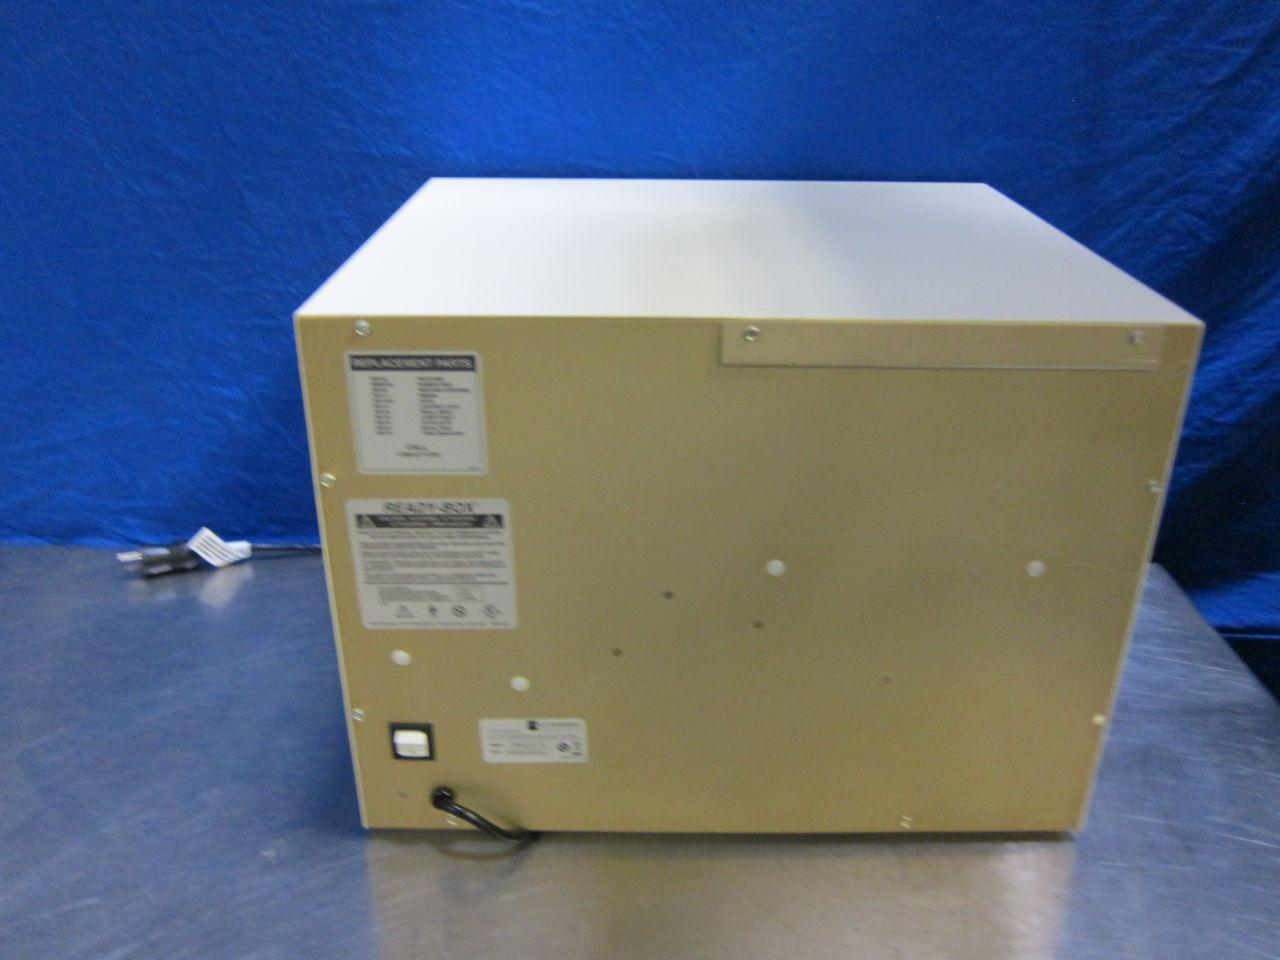 MALLINCKRODT Ready-Box Incubator